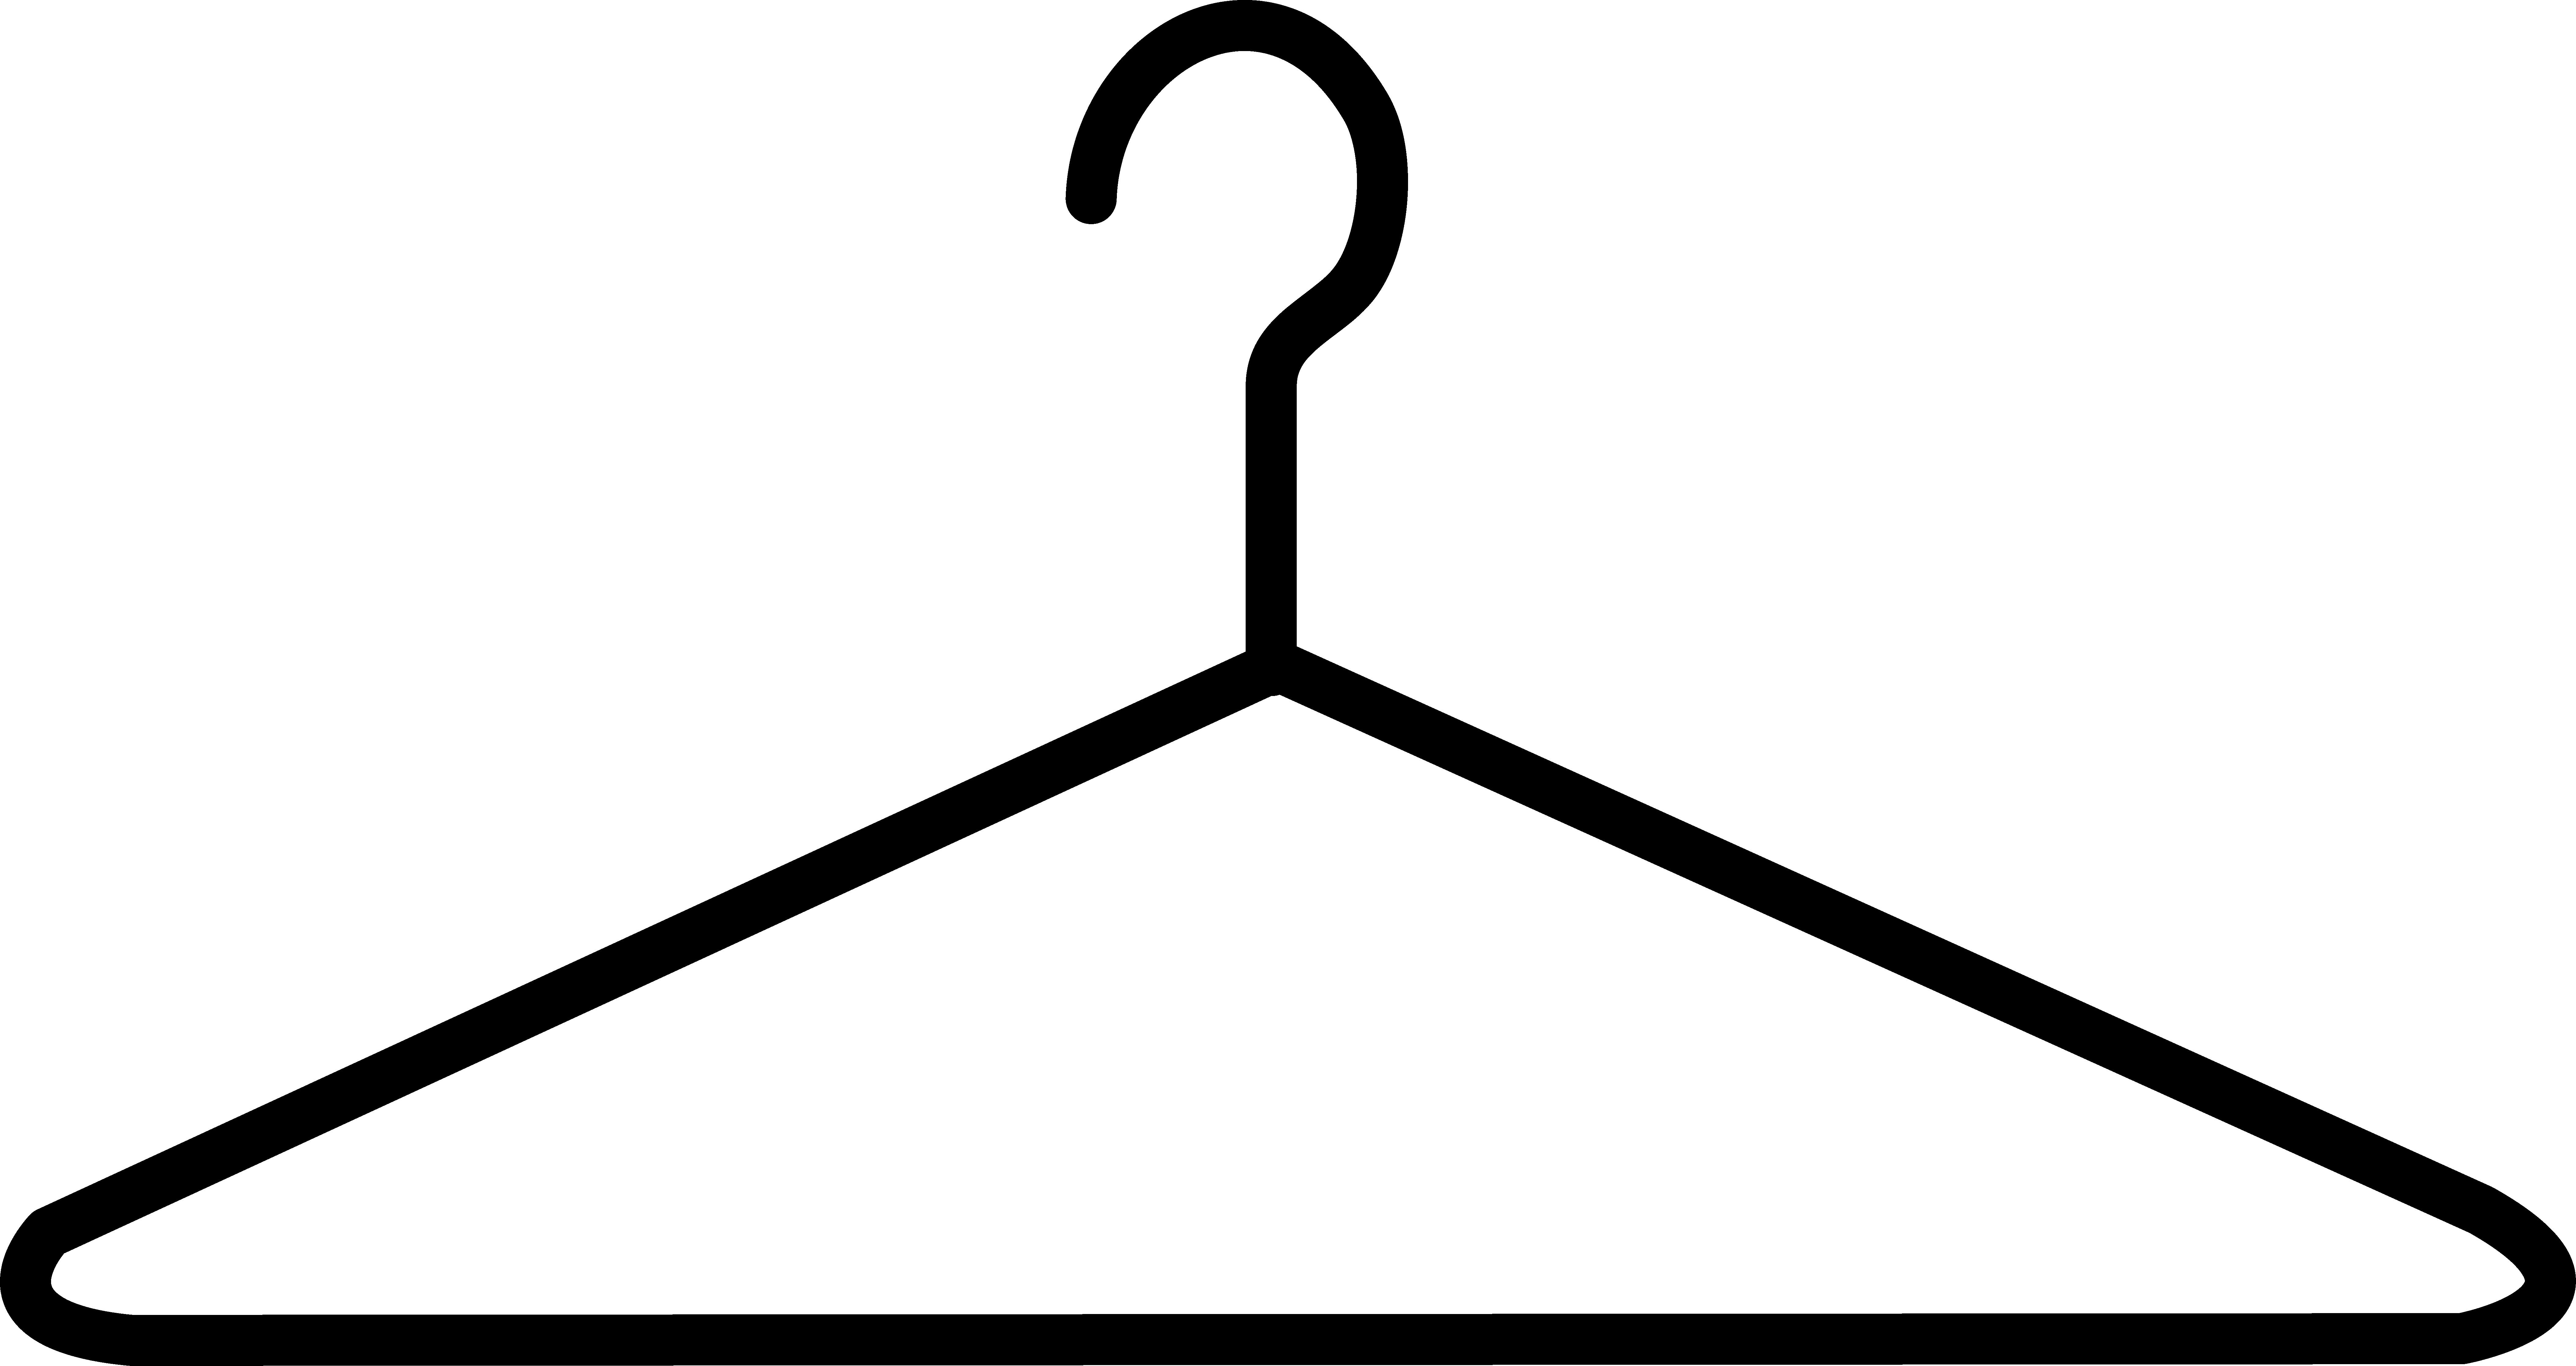 transparent download Coat Hanger Clipart